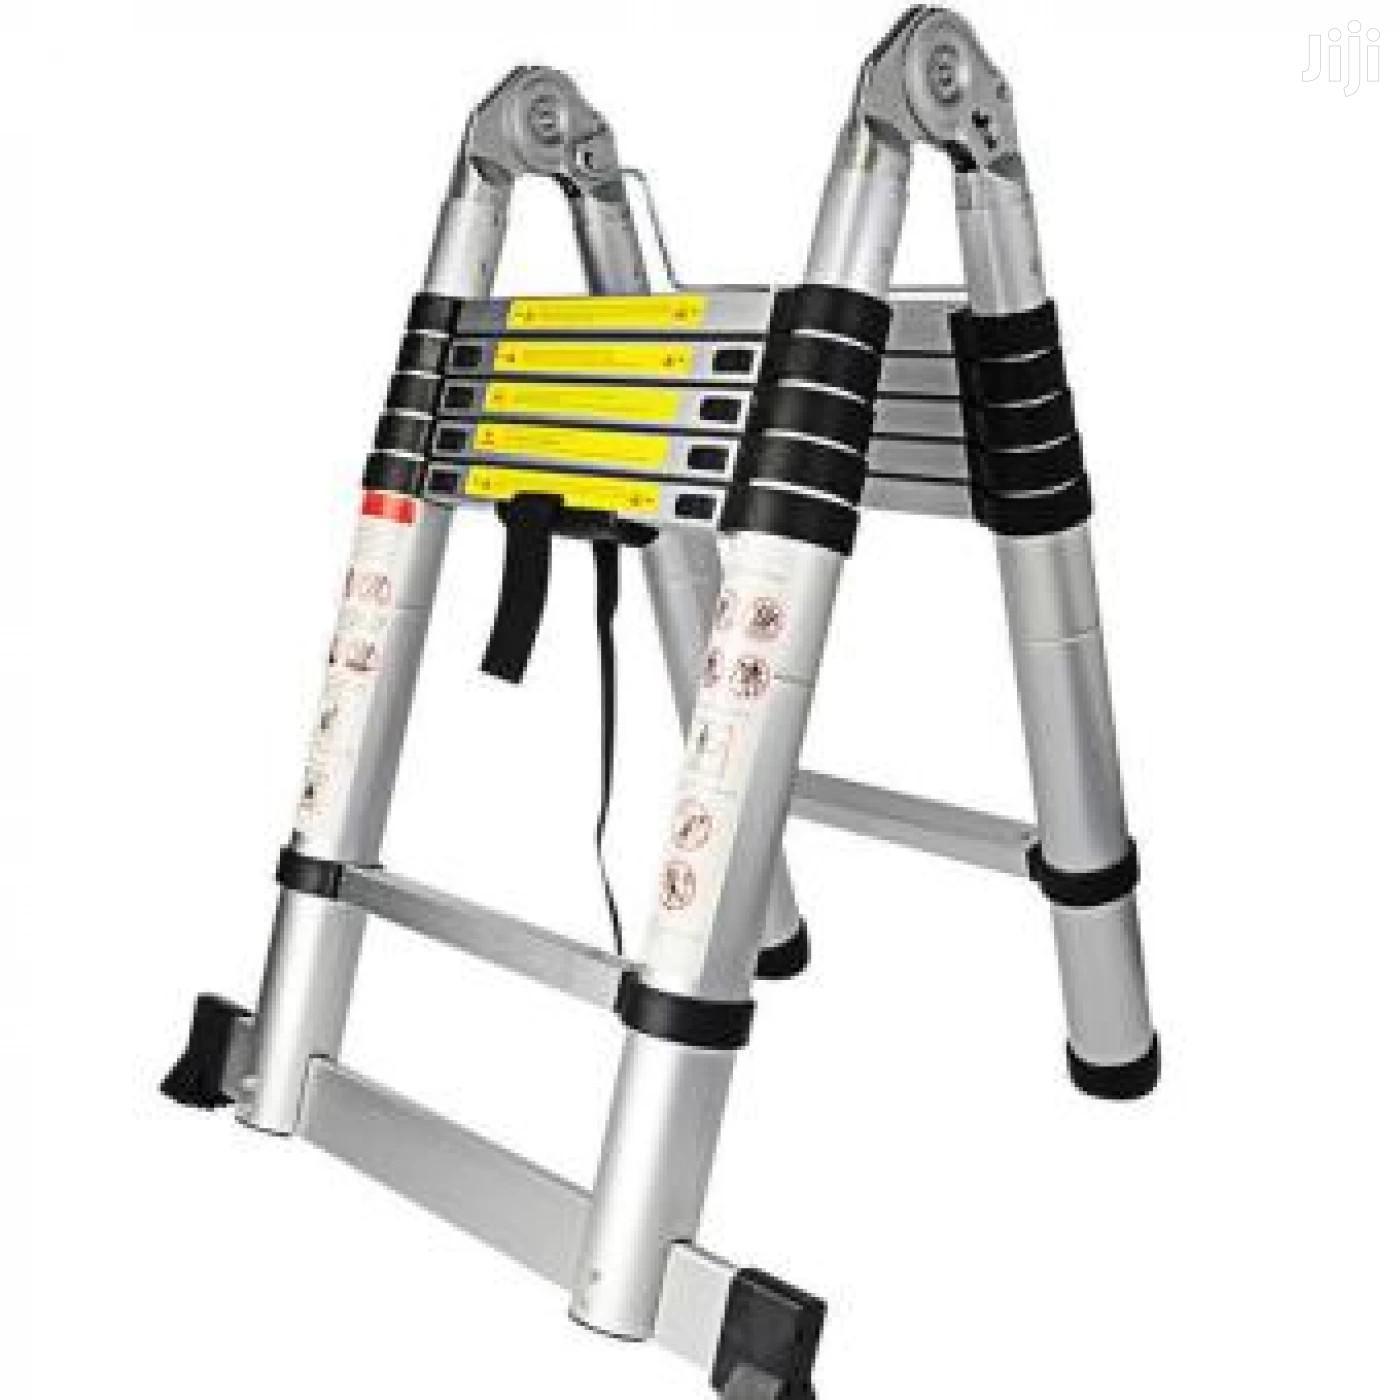 Telescopic Double Aluminum Ladder 12ft 3.8mts